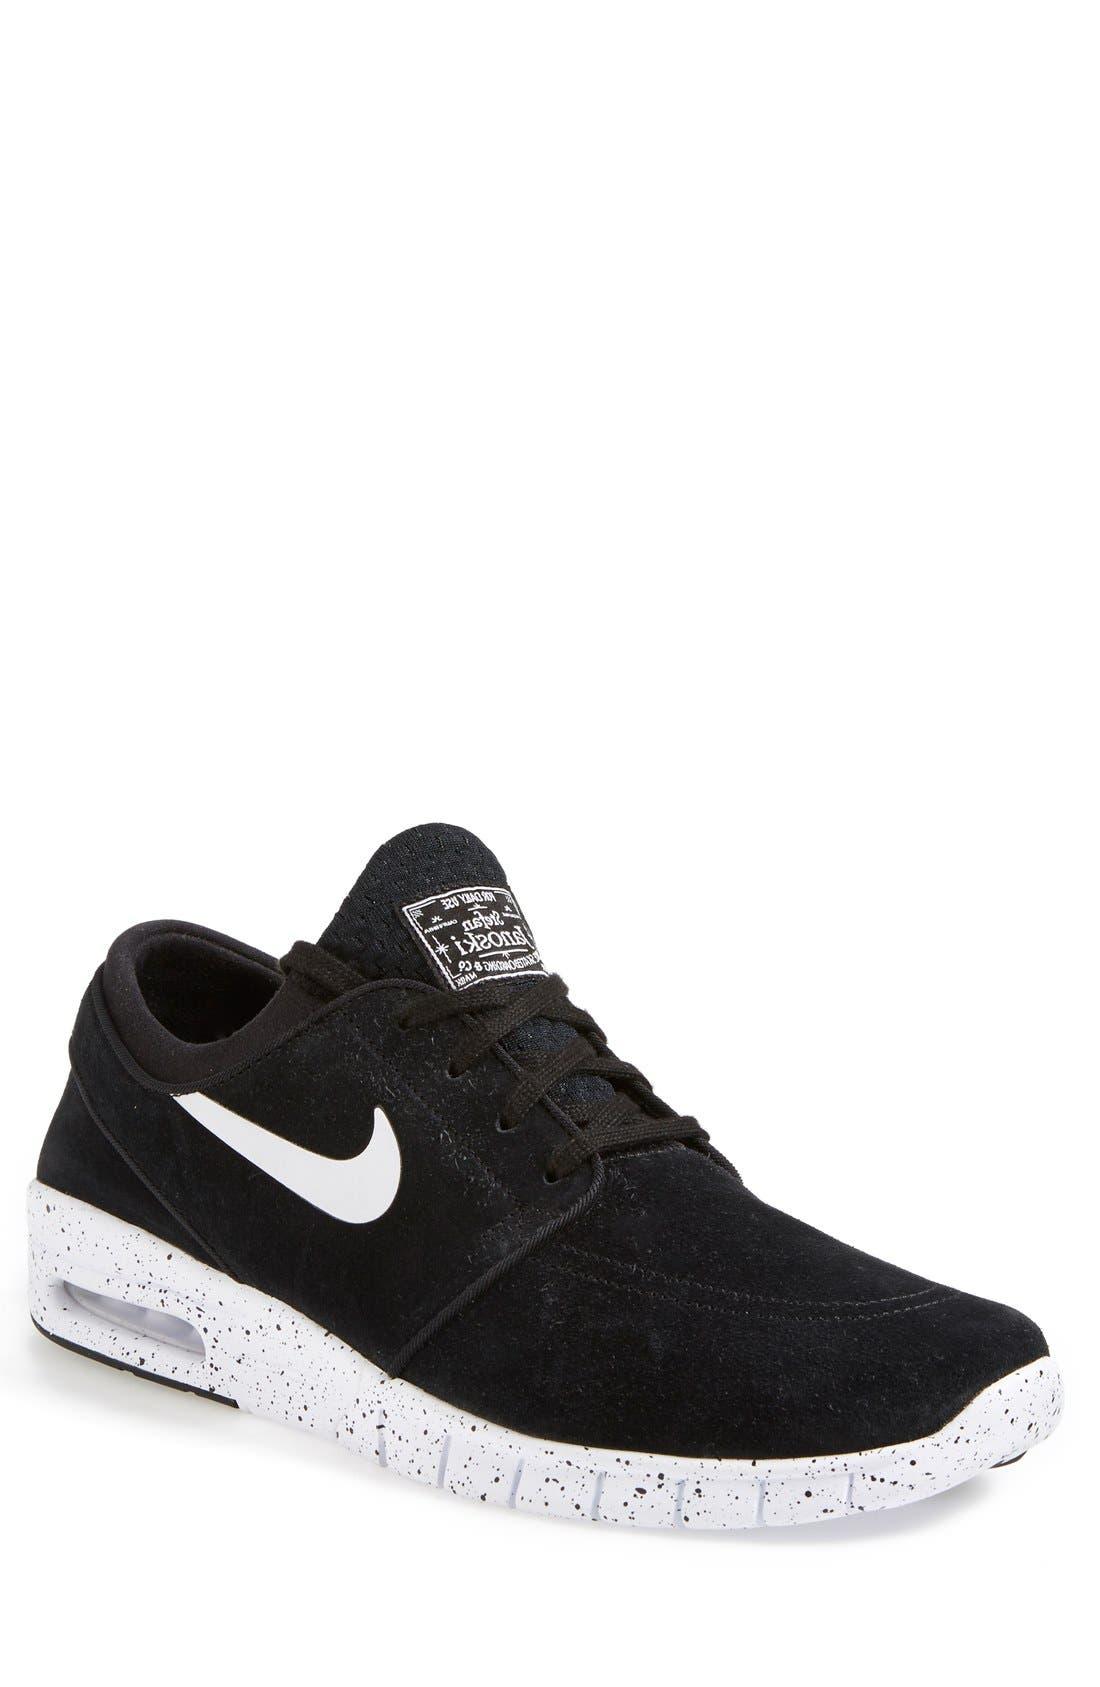 Main Image - Nike 'Stefan Janoski Max SB' Skate Sneaker (Men)